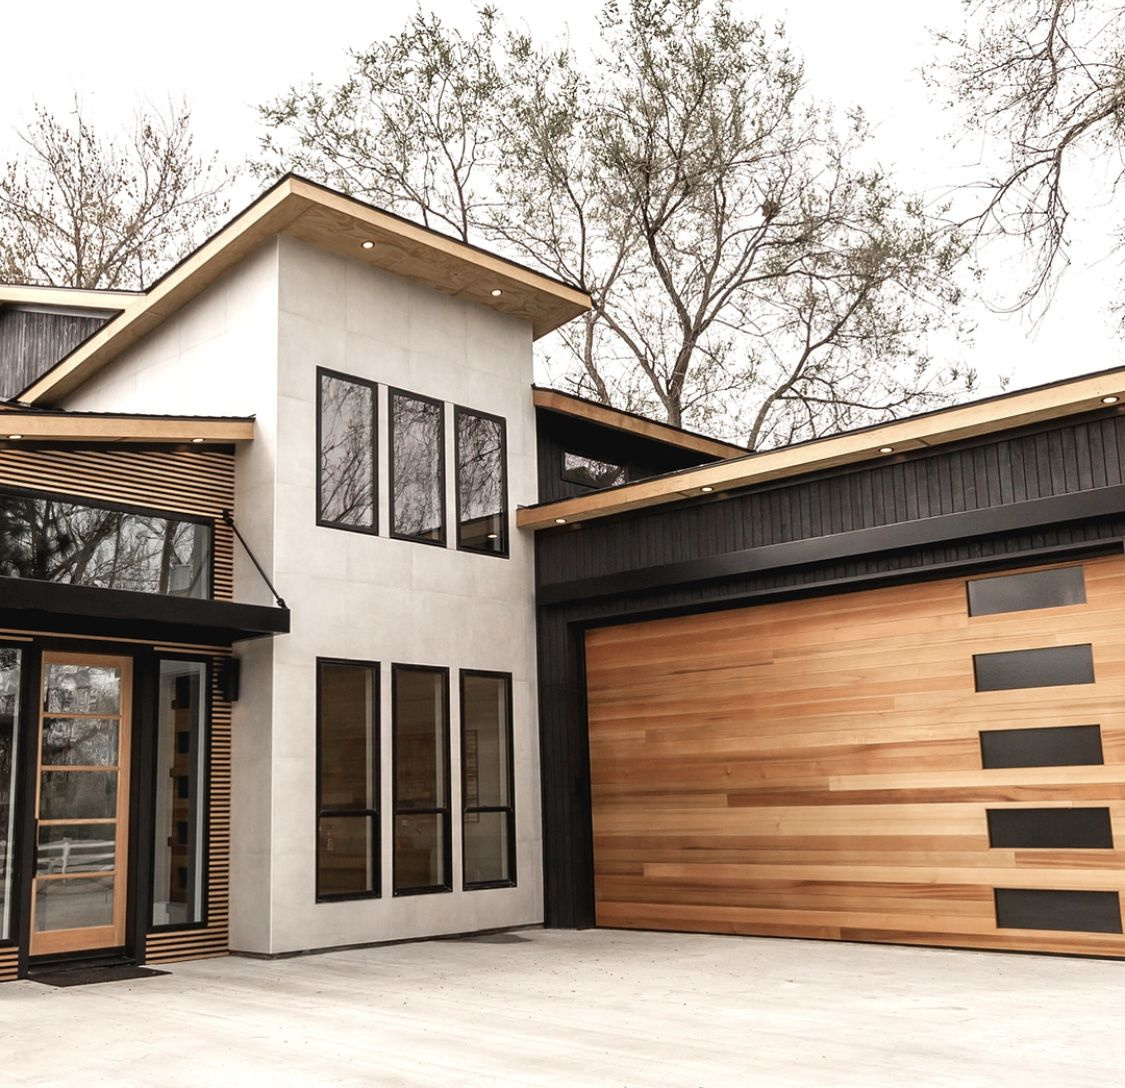 Mid Century Modern Garage Door Brings Contemporary Style